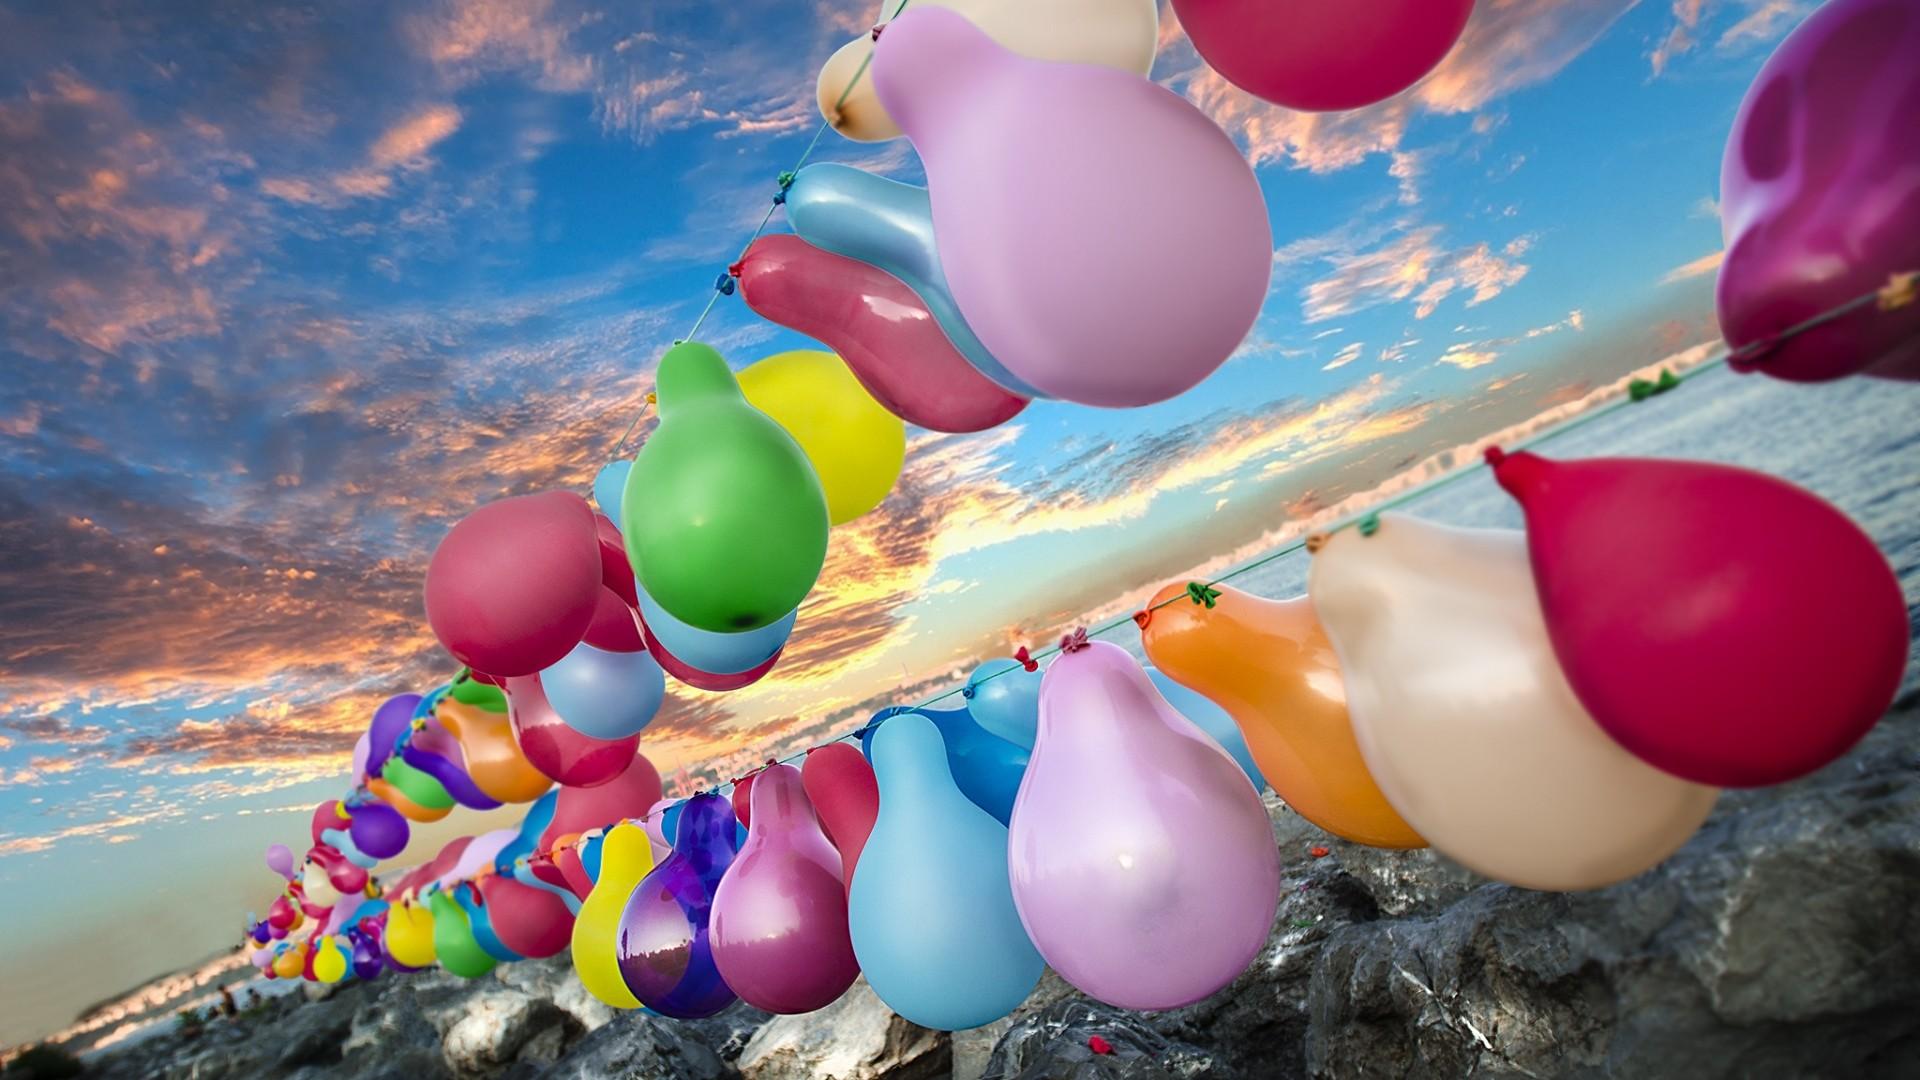 Balloon Full HD Wallpaper